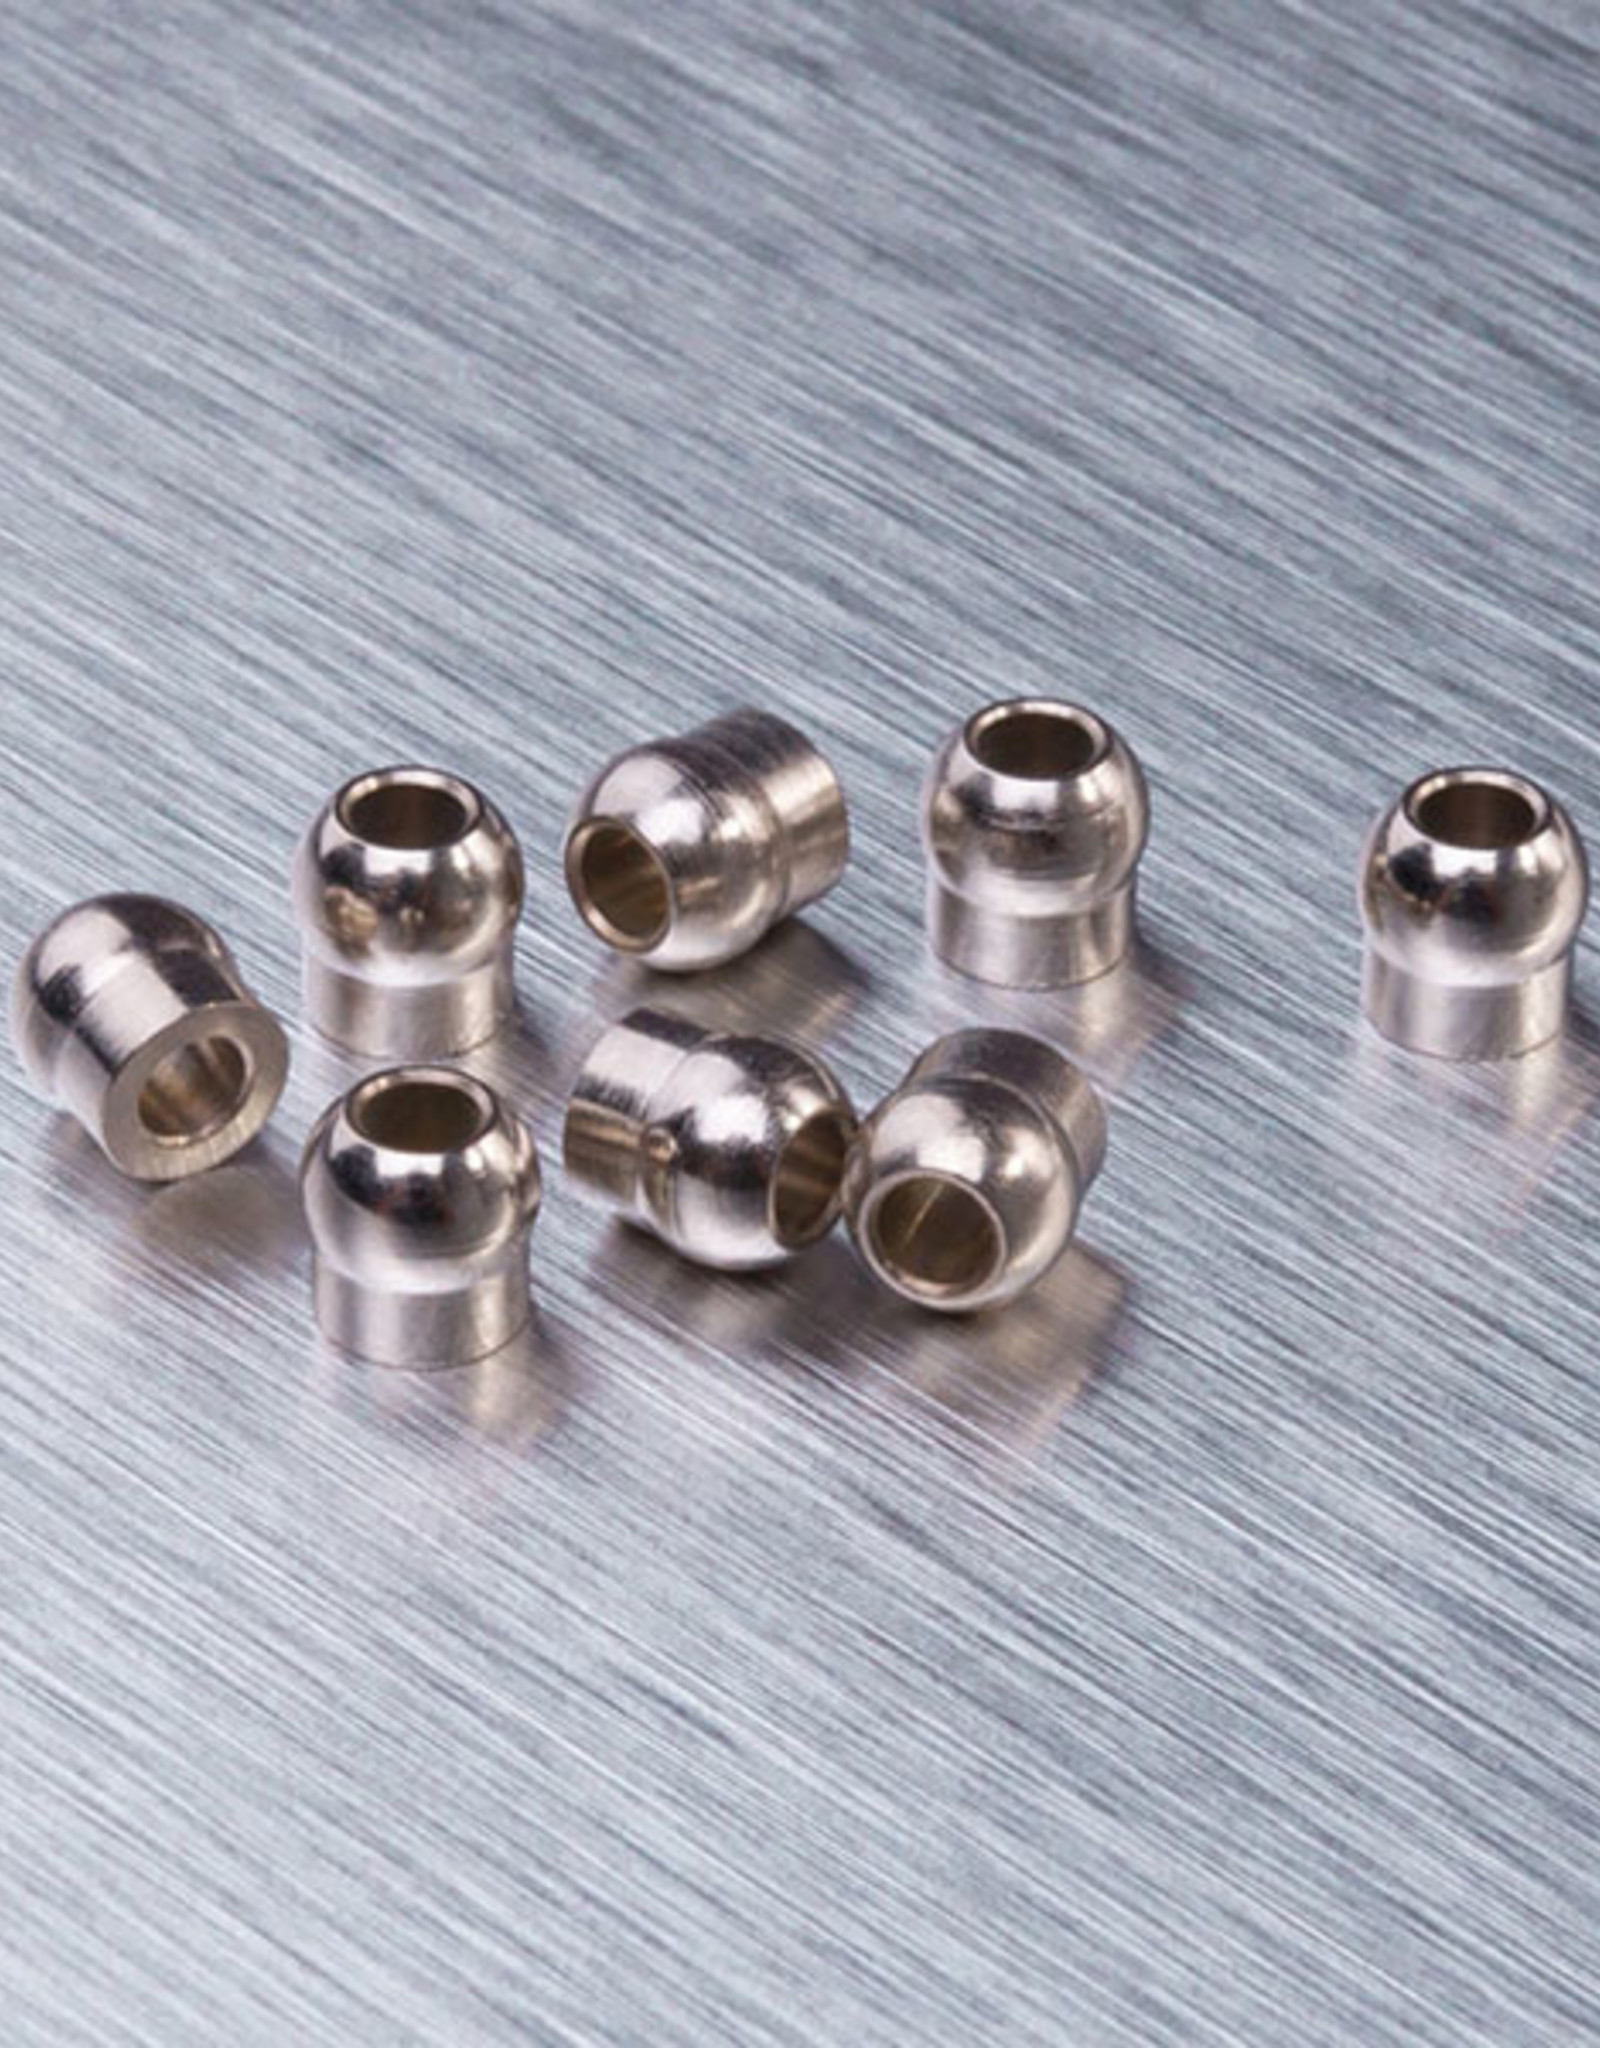 MST MXSPD210321 Suspension balls 2.5X5 (8) 210321 by MST